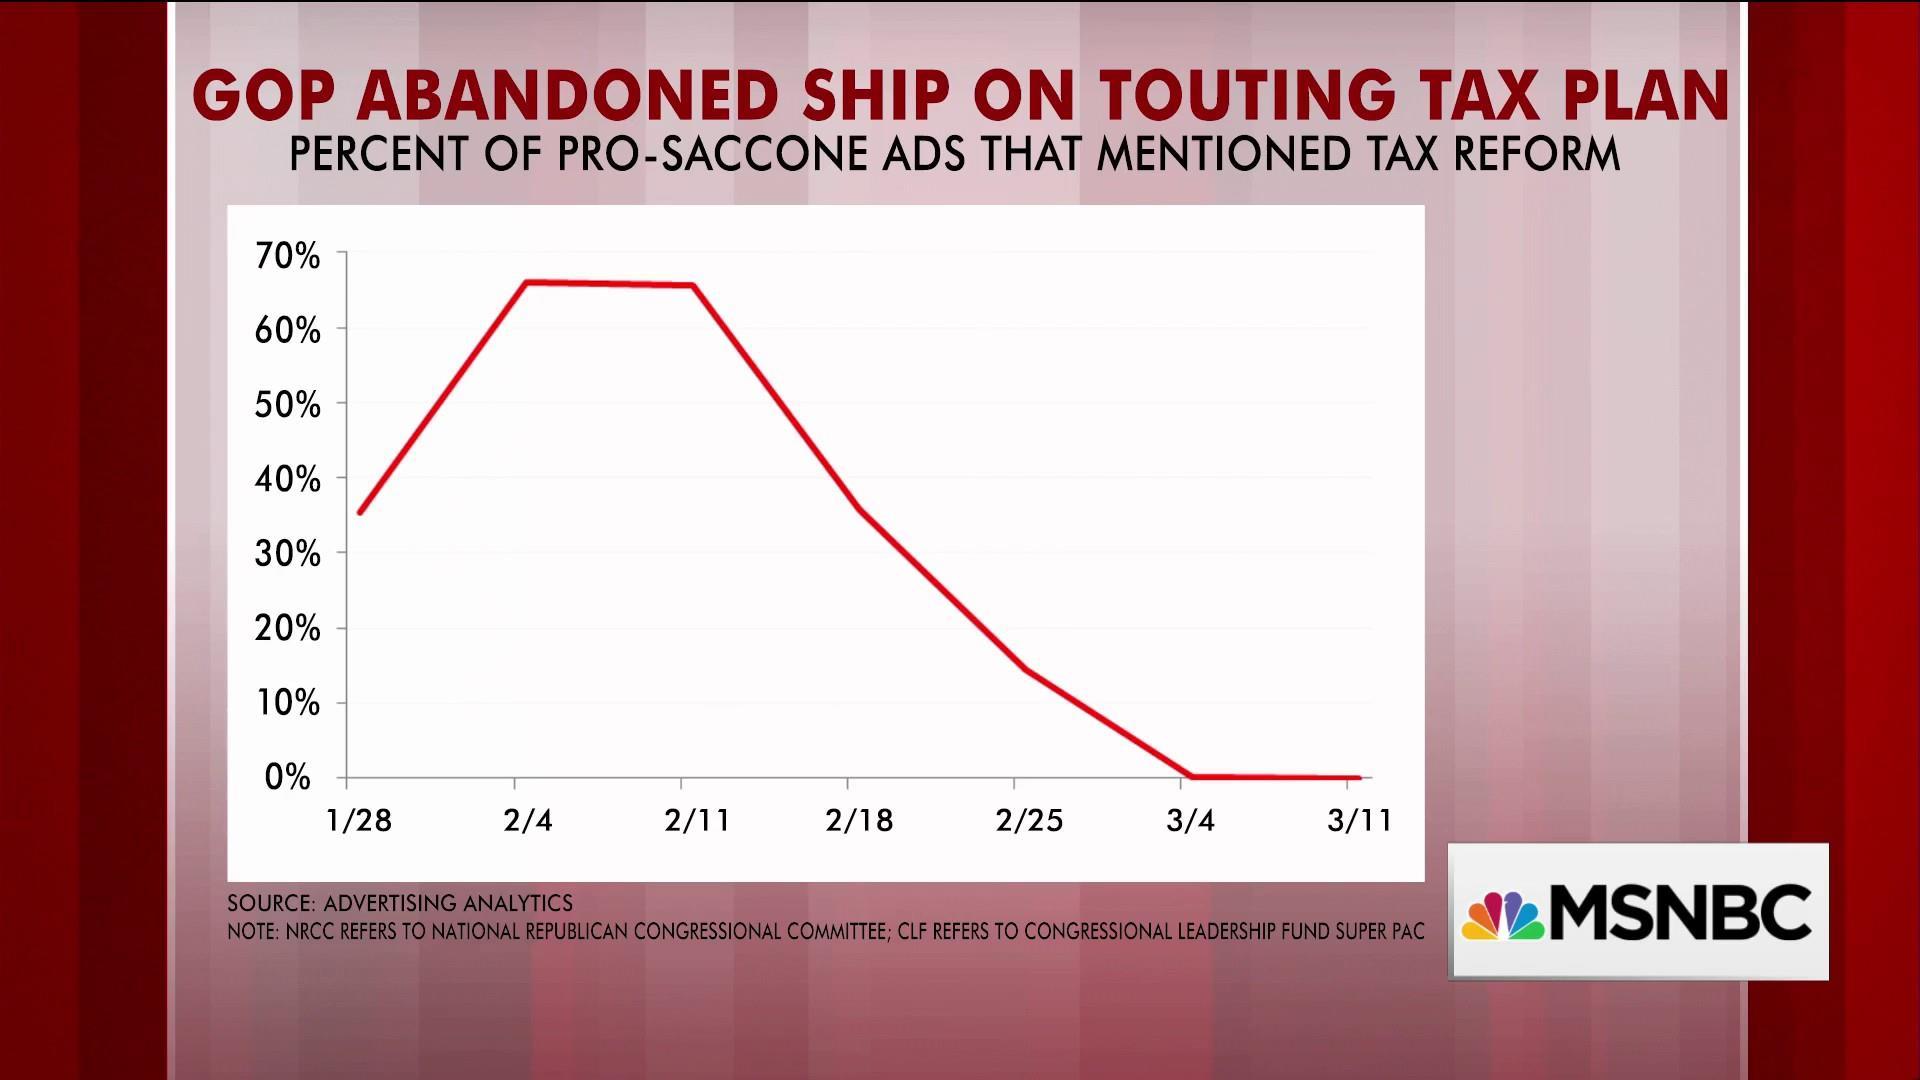 Republicans abandon ship on promoting tax plan